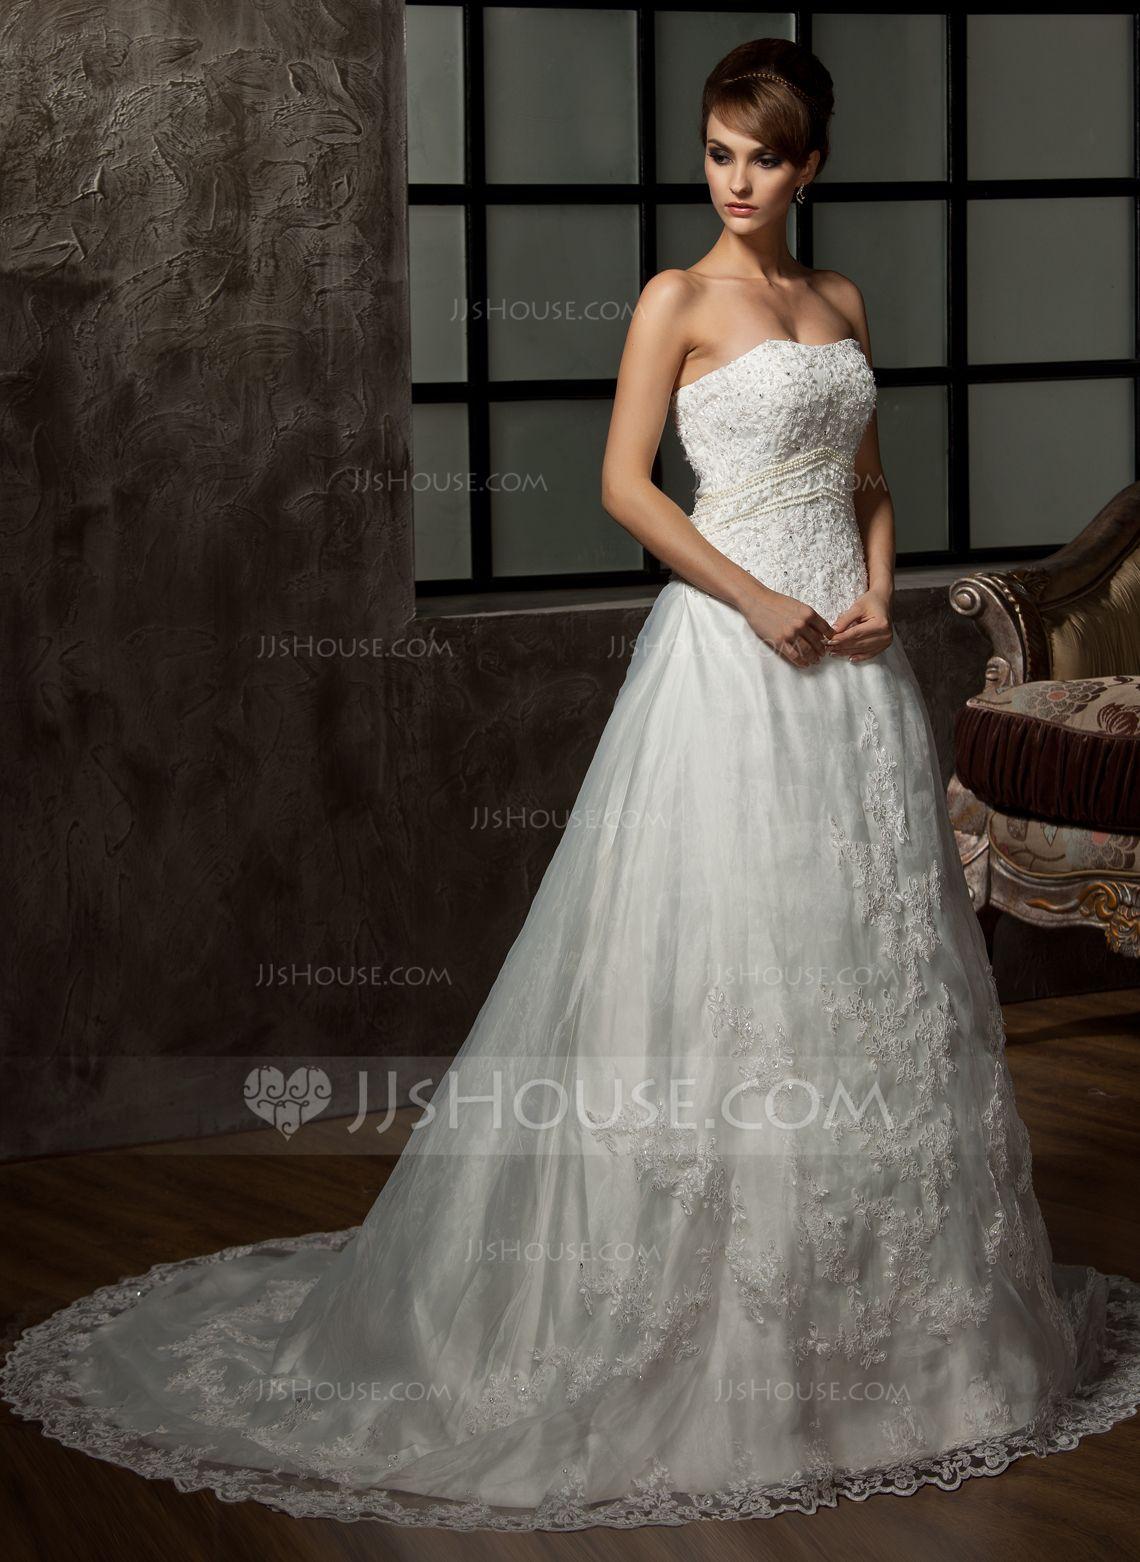 Lace dress wedding  ALinePrincess Sweetheart Chapel Train Tulle Wedding Dress With